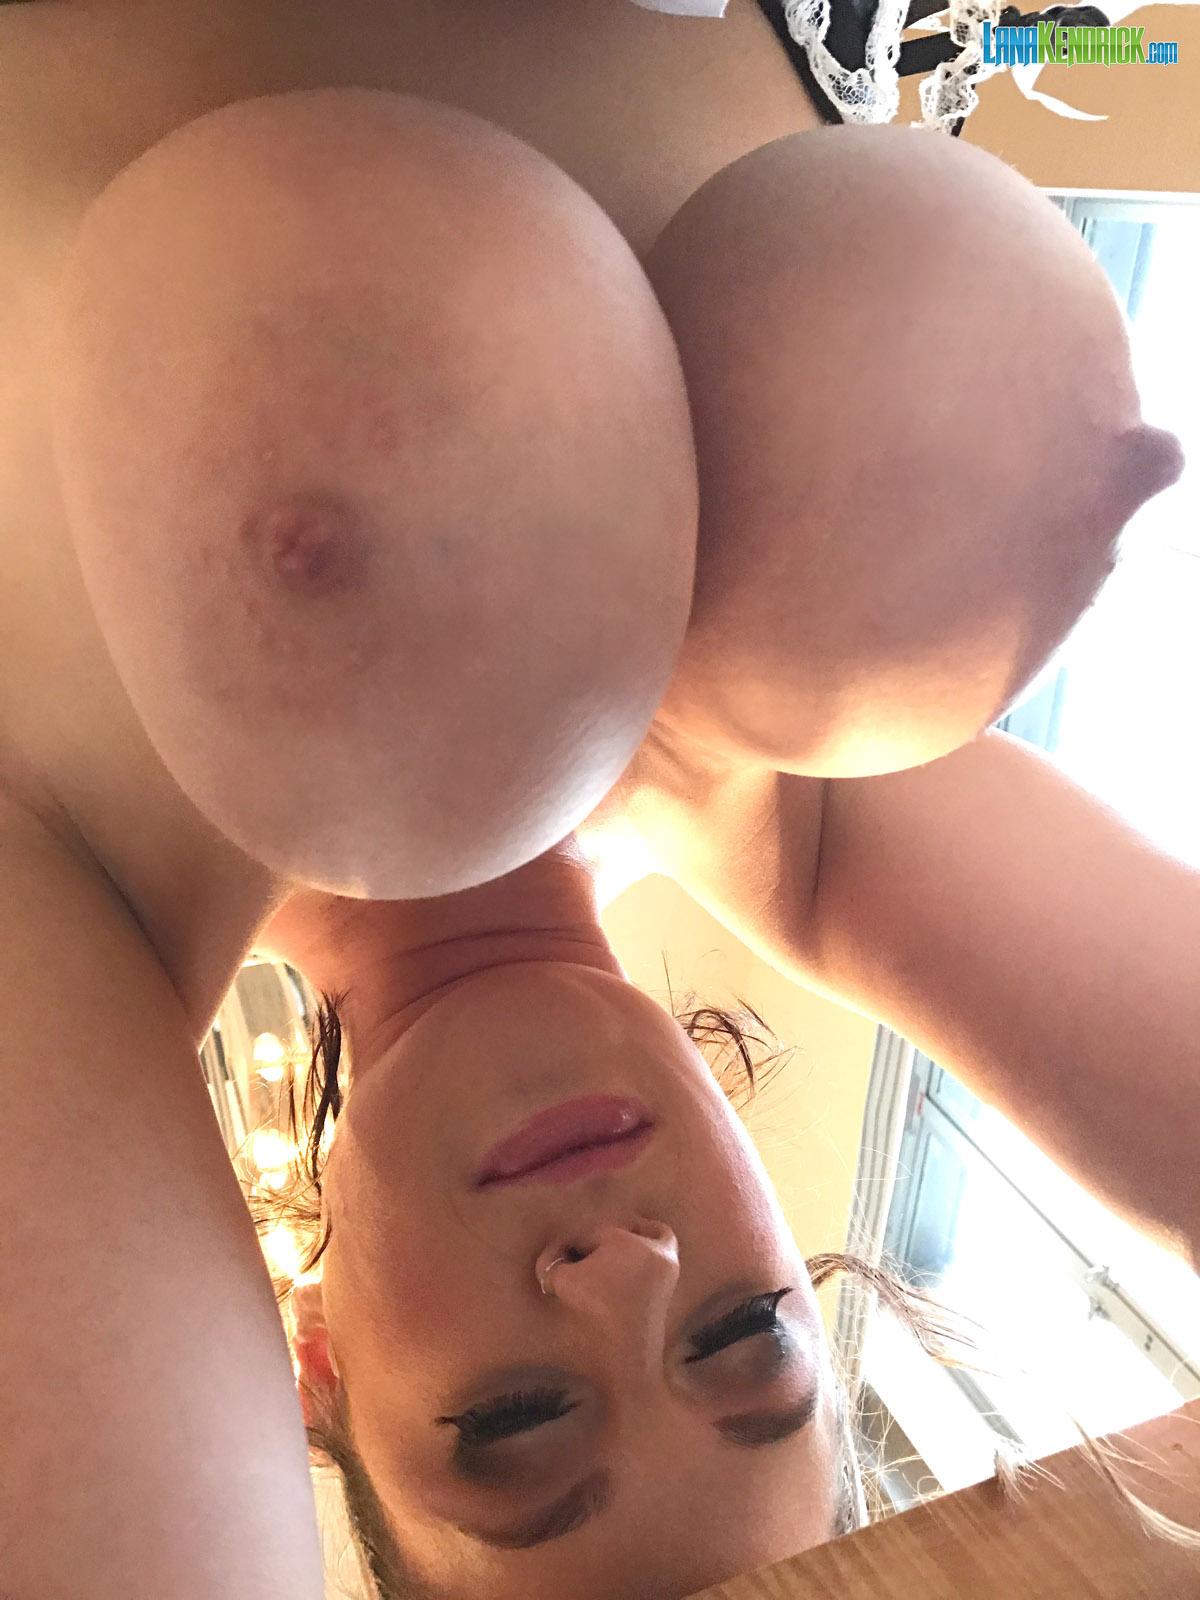 Big boobs terry nova anal - 3 5